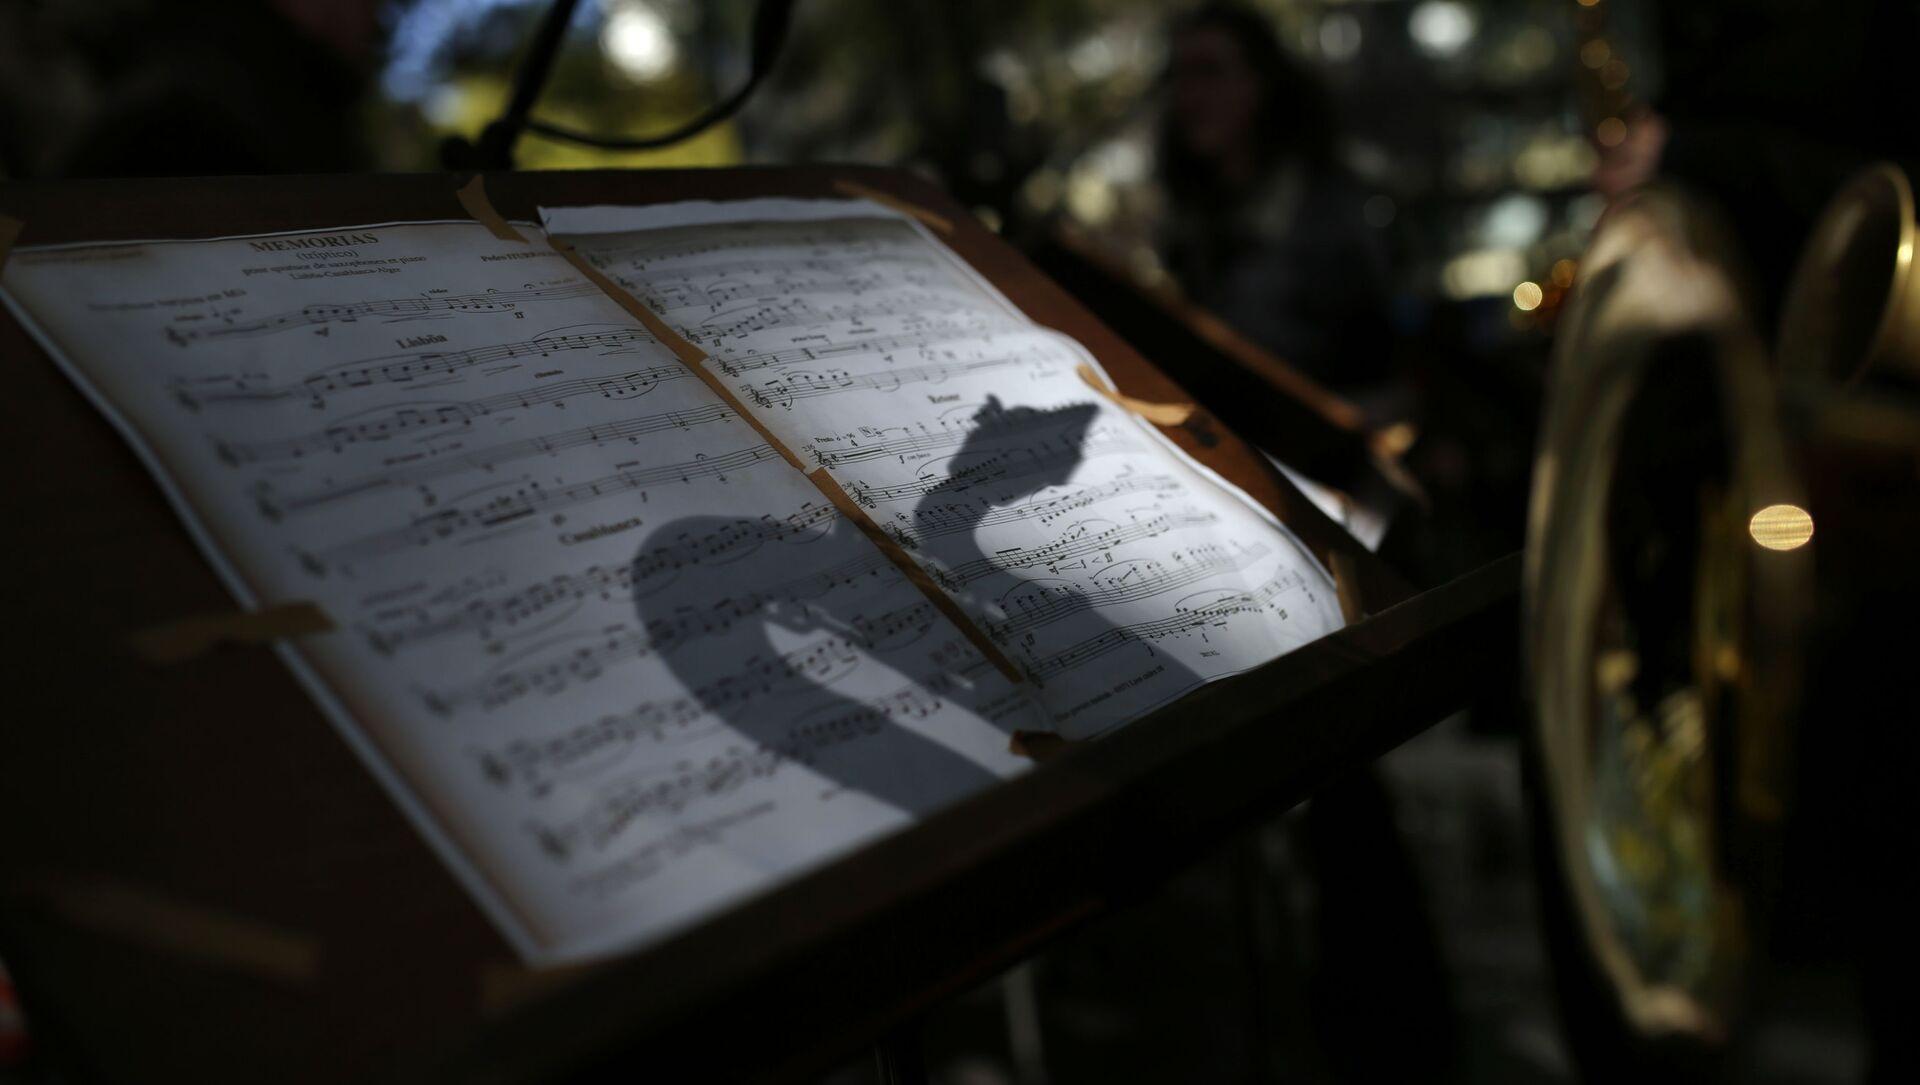 Тень саксофона на крафт бумаге, фото из архива - Sputnik Azərbaycan, 1920, 15.09.2021